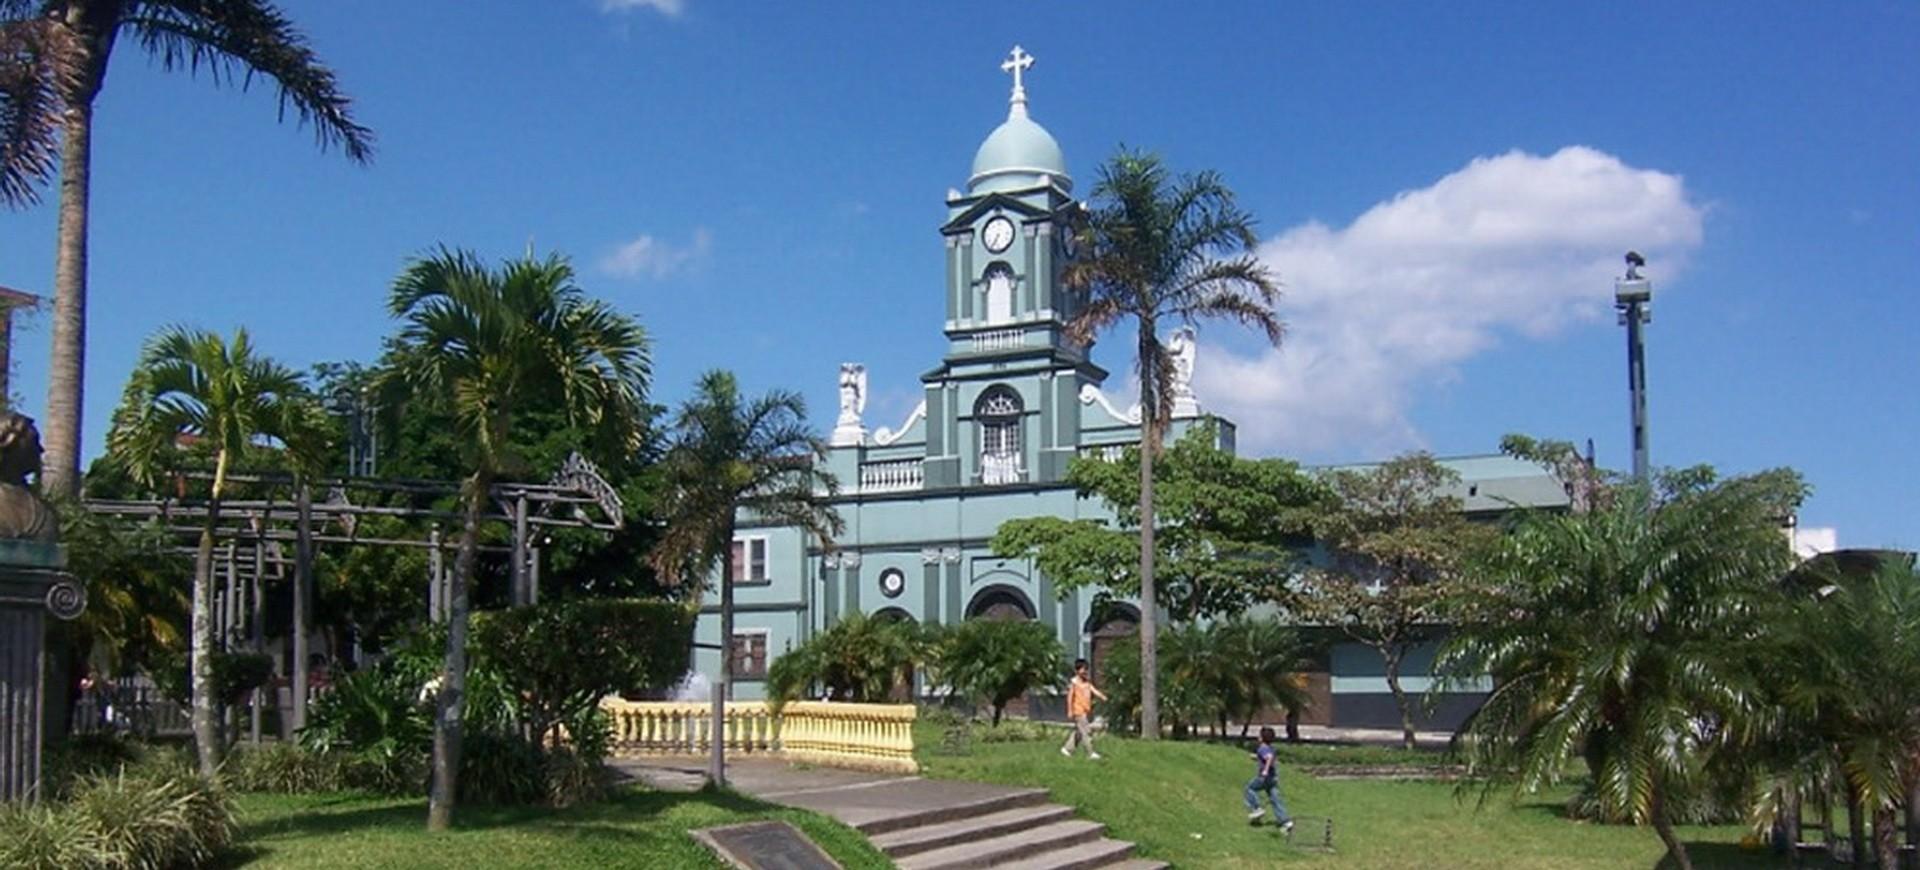 Costa Rica San José Eglise